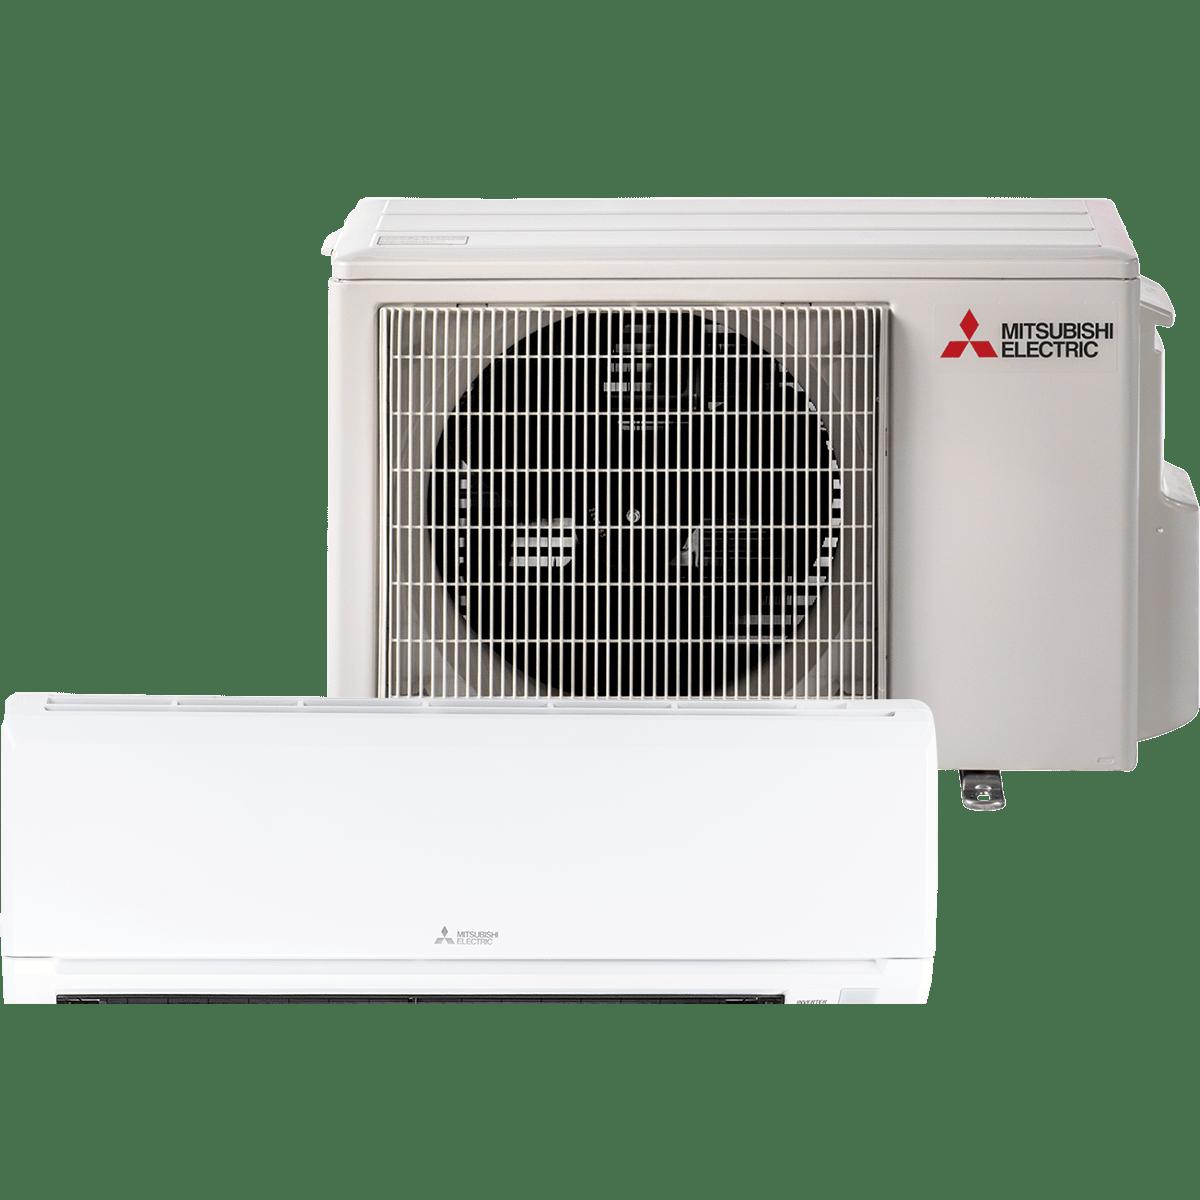 Mitsubishi Room Air Conditioner Reviews: Mitsubishi MY-GL09NA Mini Split - Free Shipping